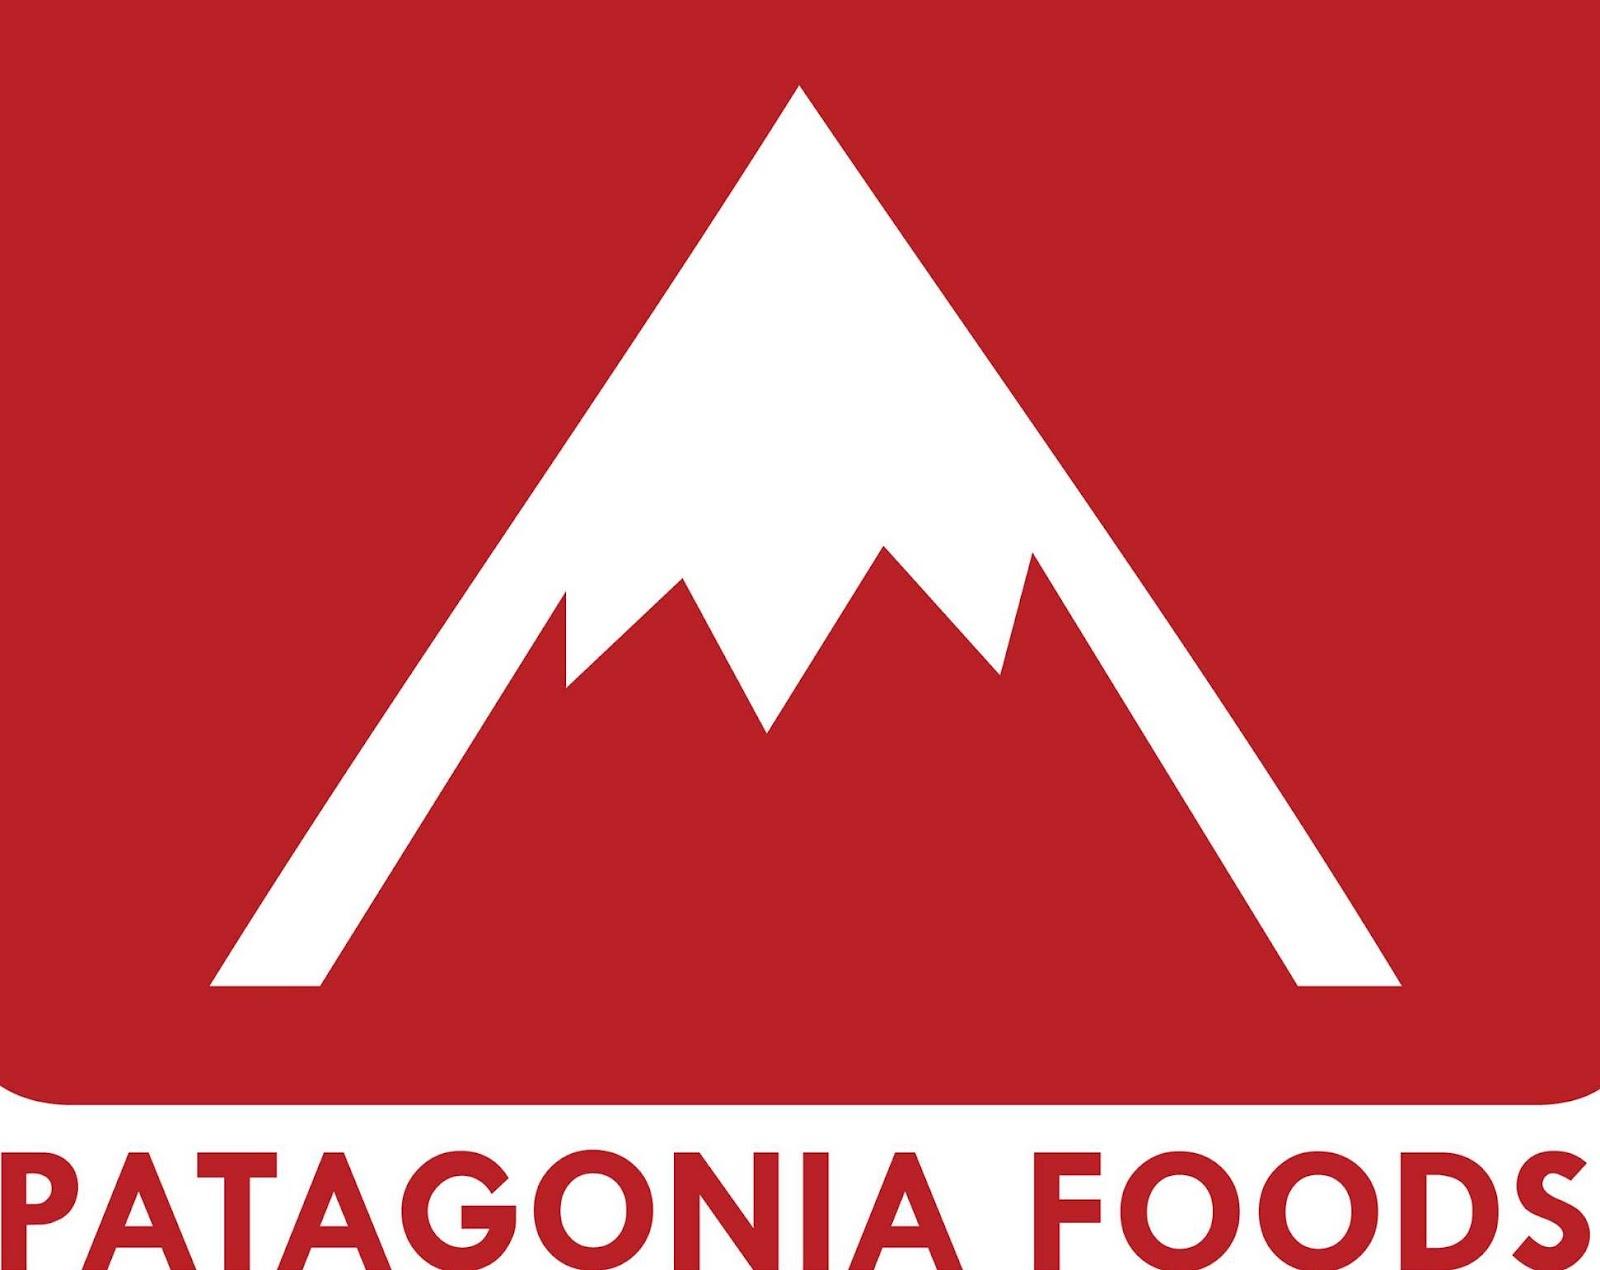 Patagonia_Foods.png